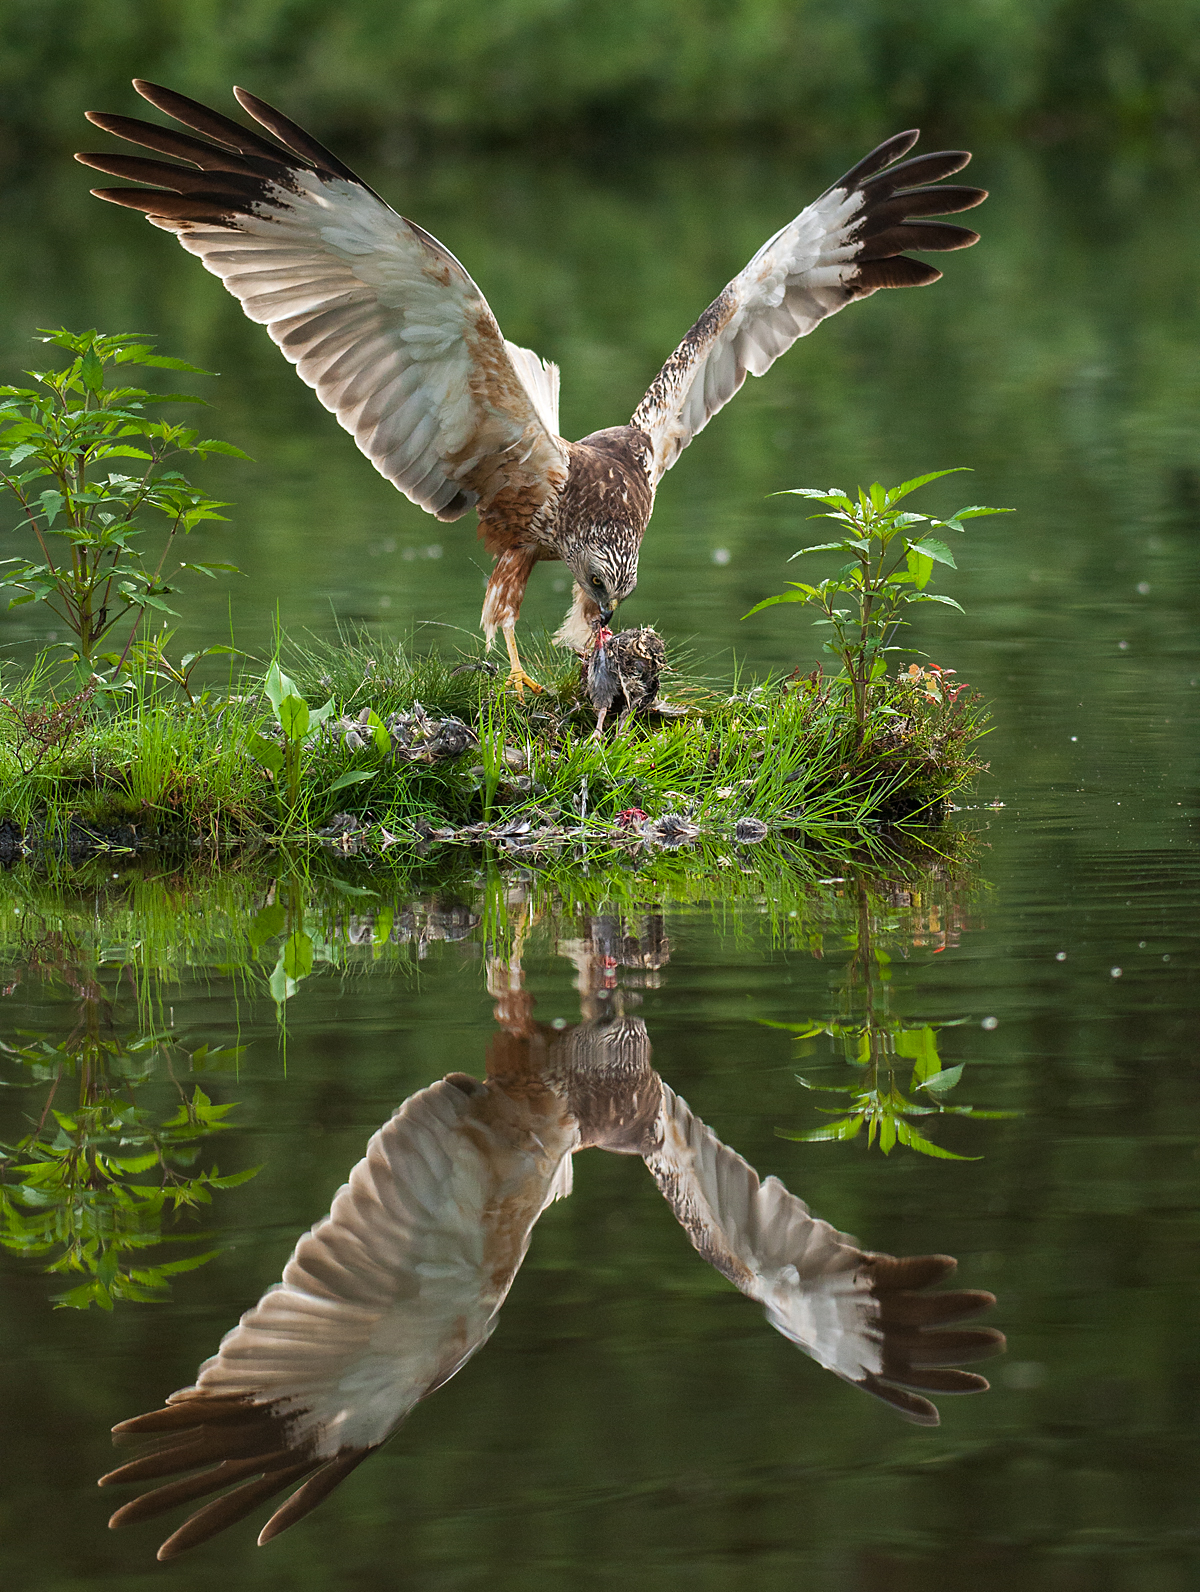 Rohrweihe, Circus aeruginosus, Marsh Harrier, greifvögel, Accipitriformes, raptors, vögel, birds